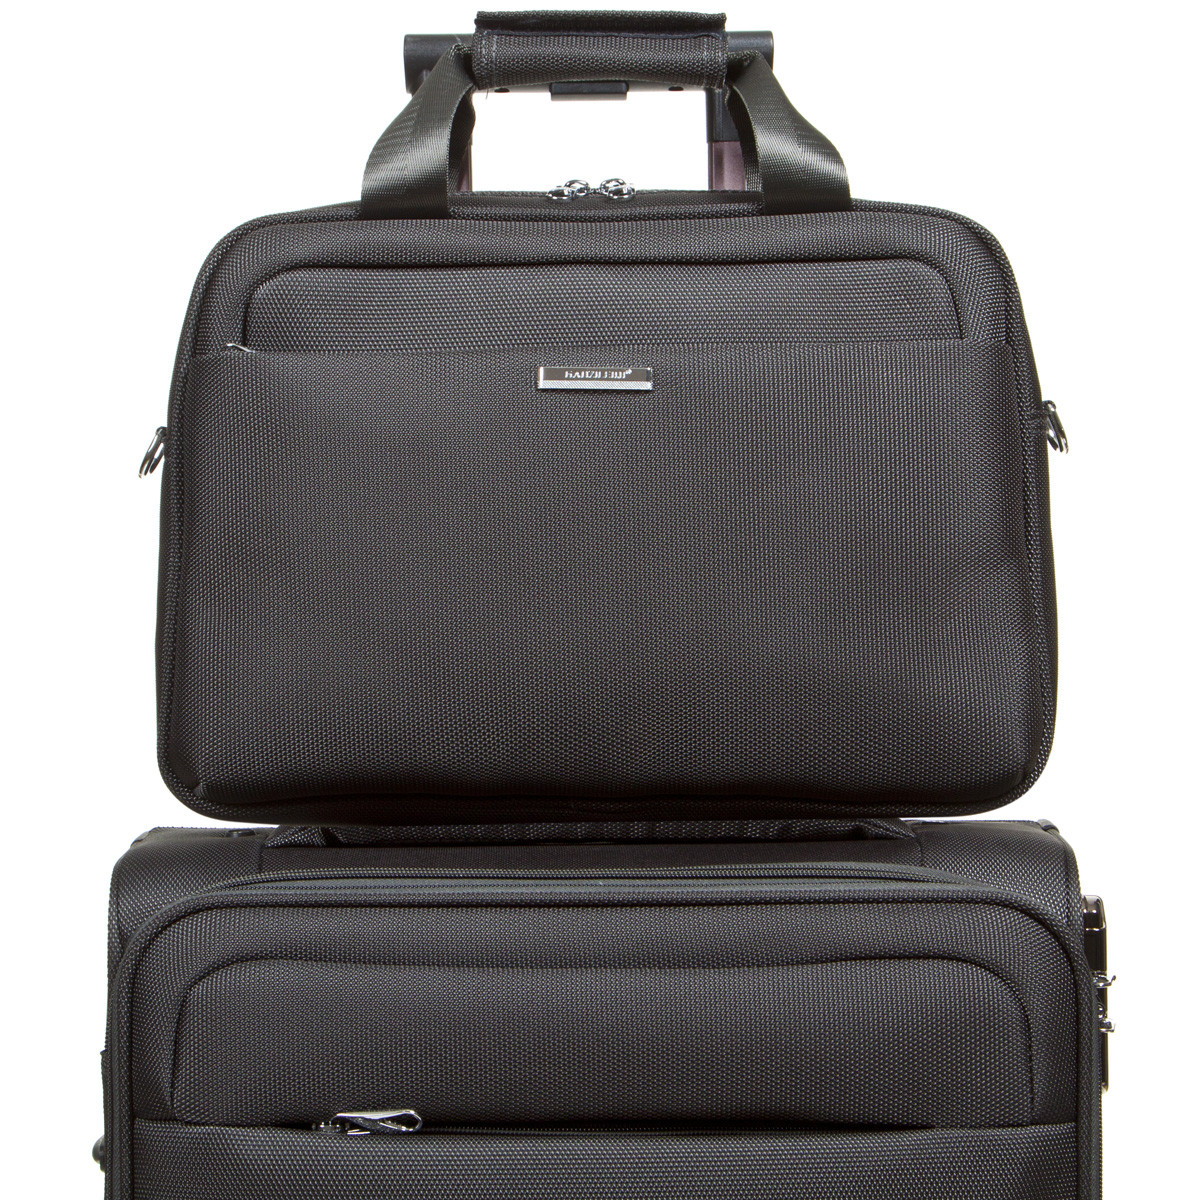 Універсальна дорожня сіра сумка-бьютик BagHouse з кріпленням на ручку валізи 38х29х15 ксГЦ868сер